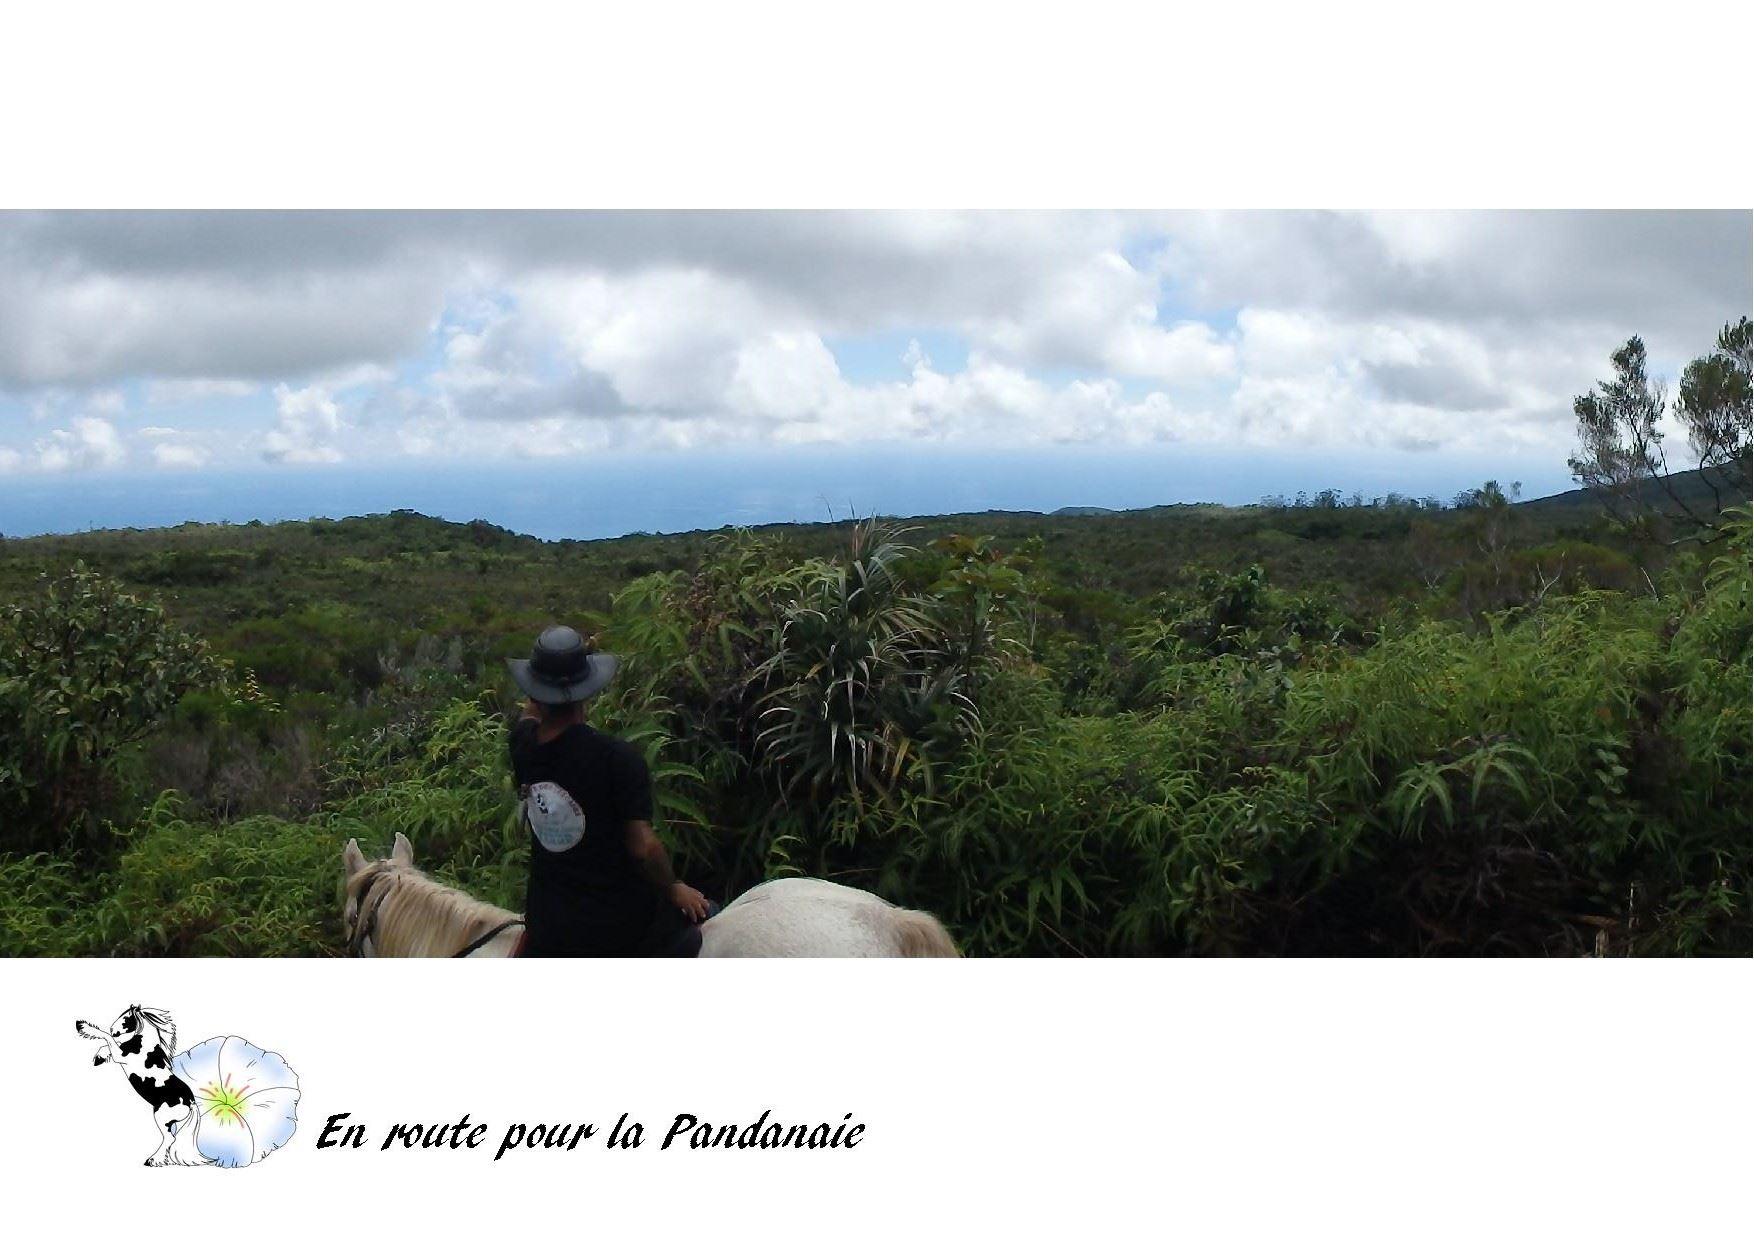 Discovering pandanas and waterfalls on horseback